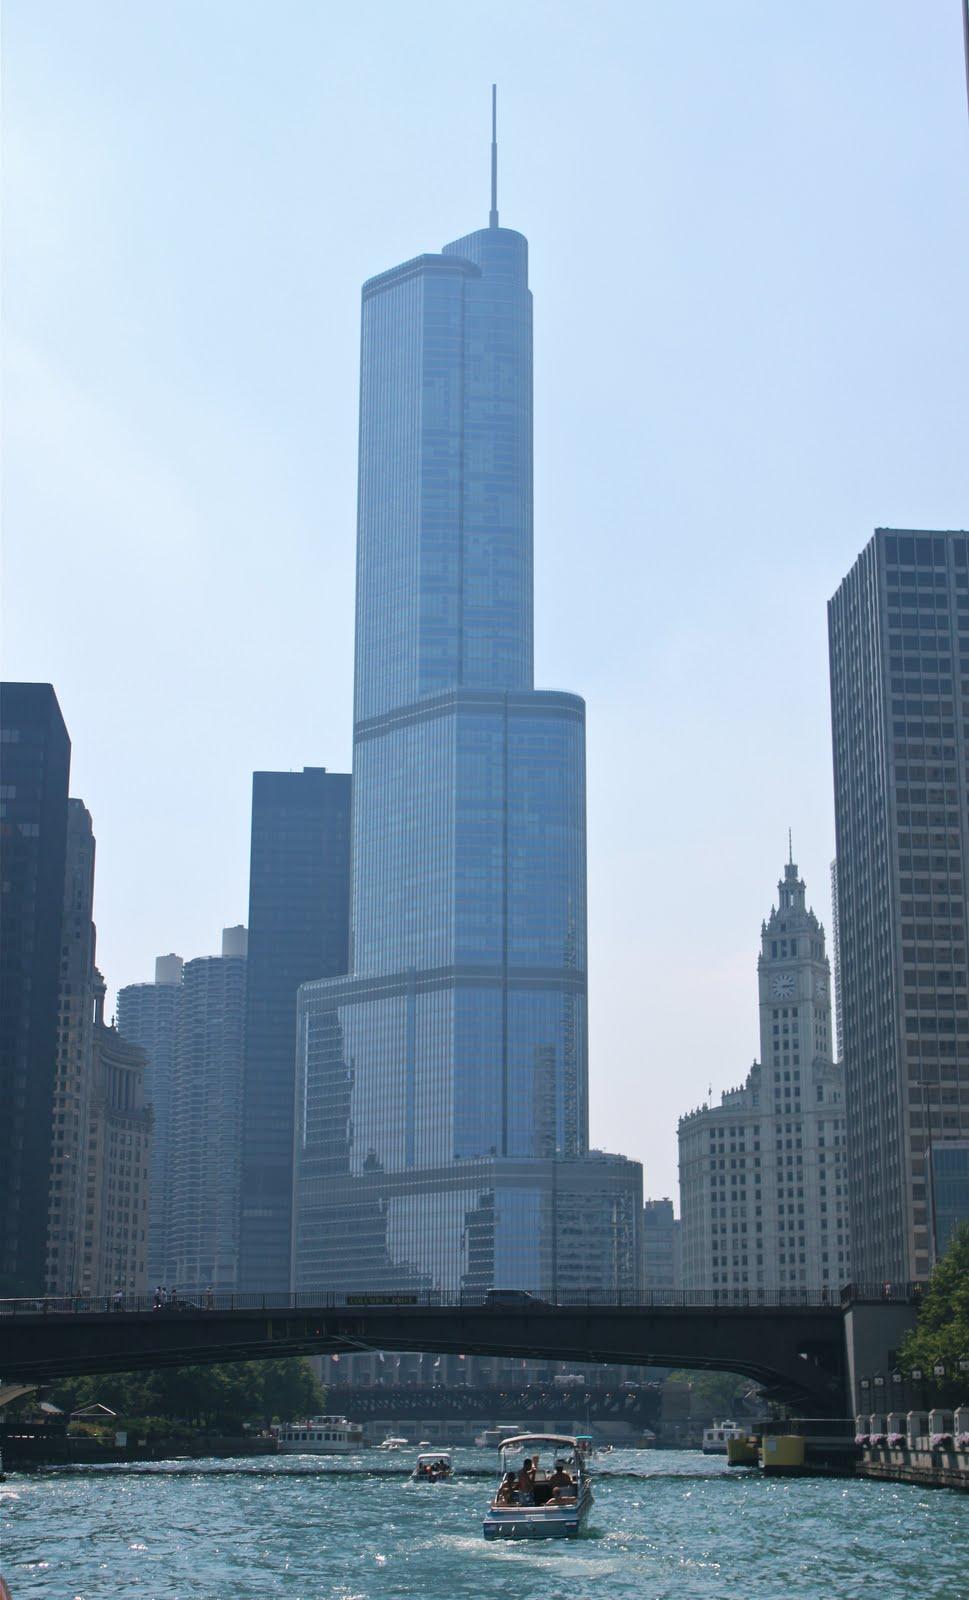 A Beautiful Day in Chicago - La Bella Vita Cucina